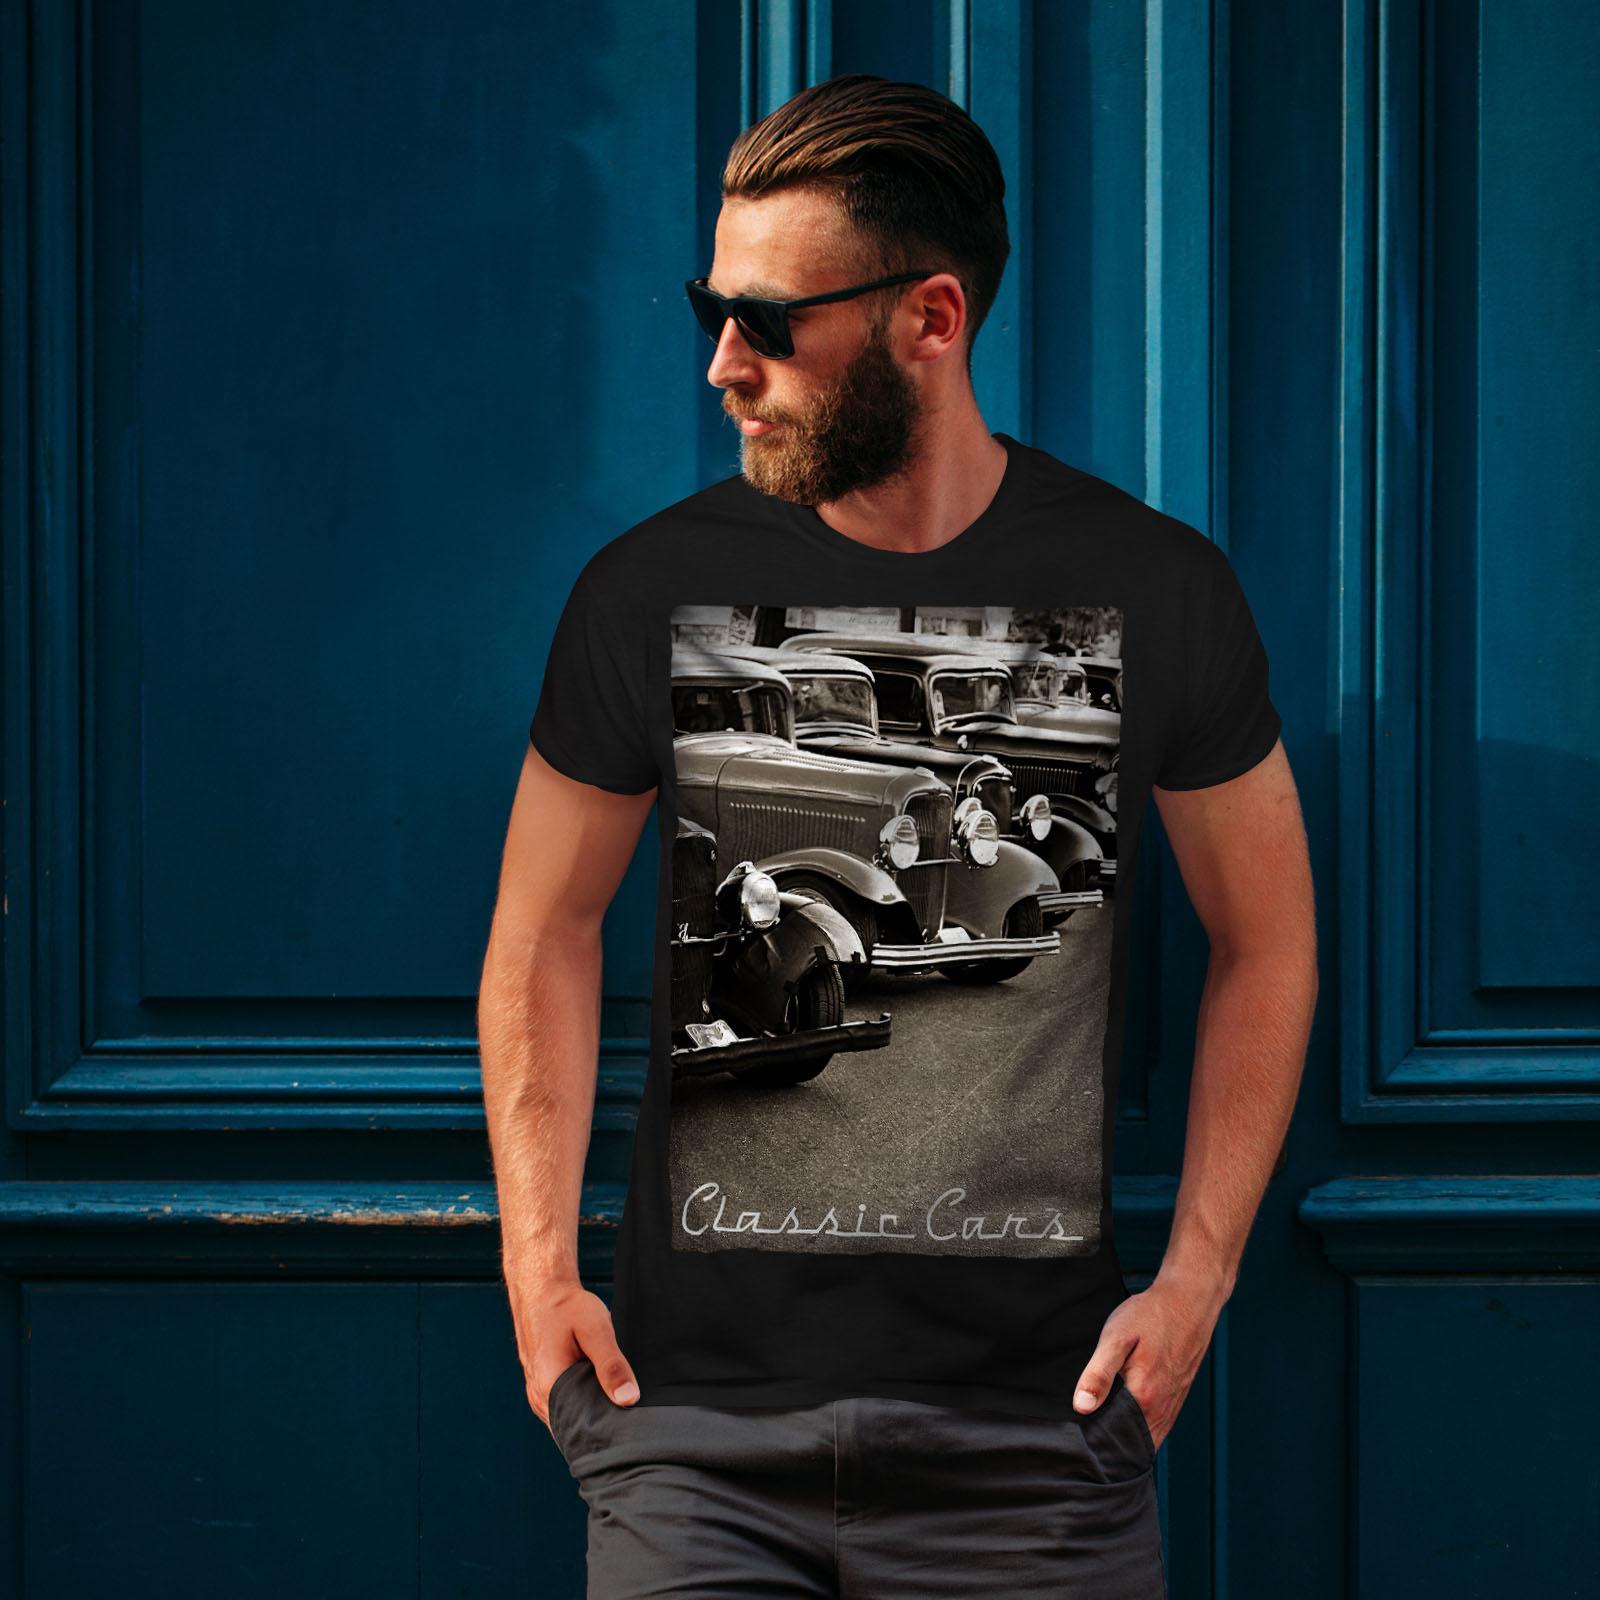 Wellcoda-Classic-Cars-Mens-T-shirt-Retro-Graphic-Design-Printed-Tee thumbnail 4